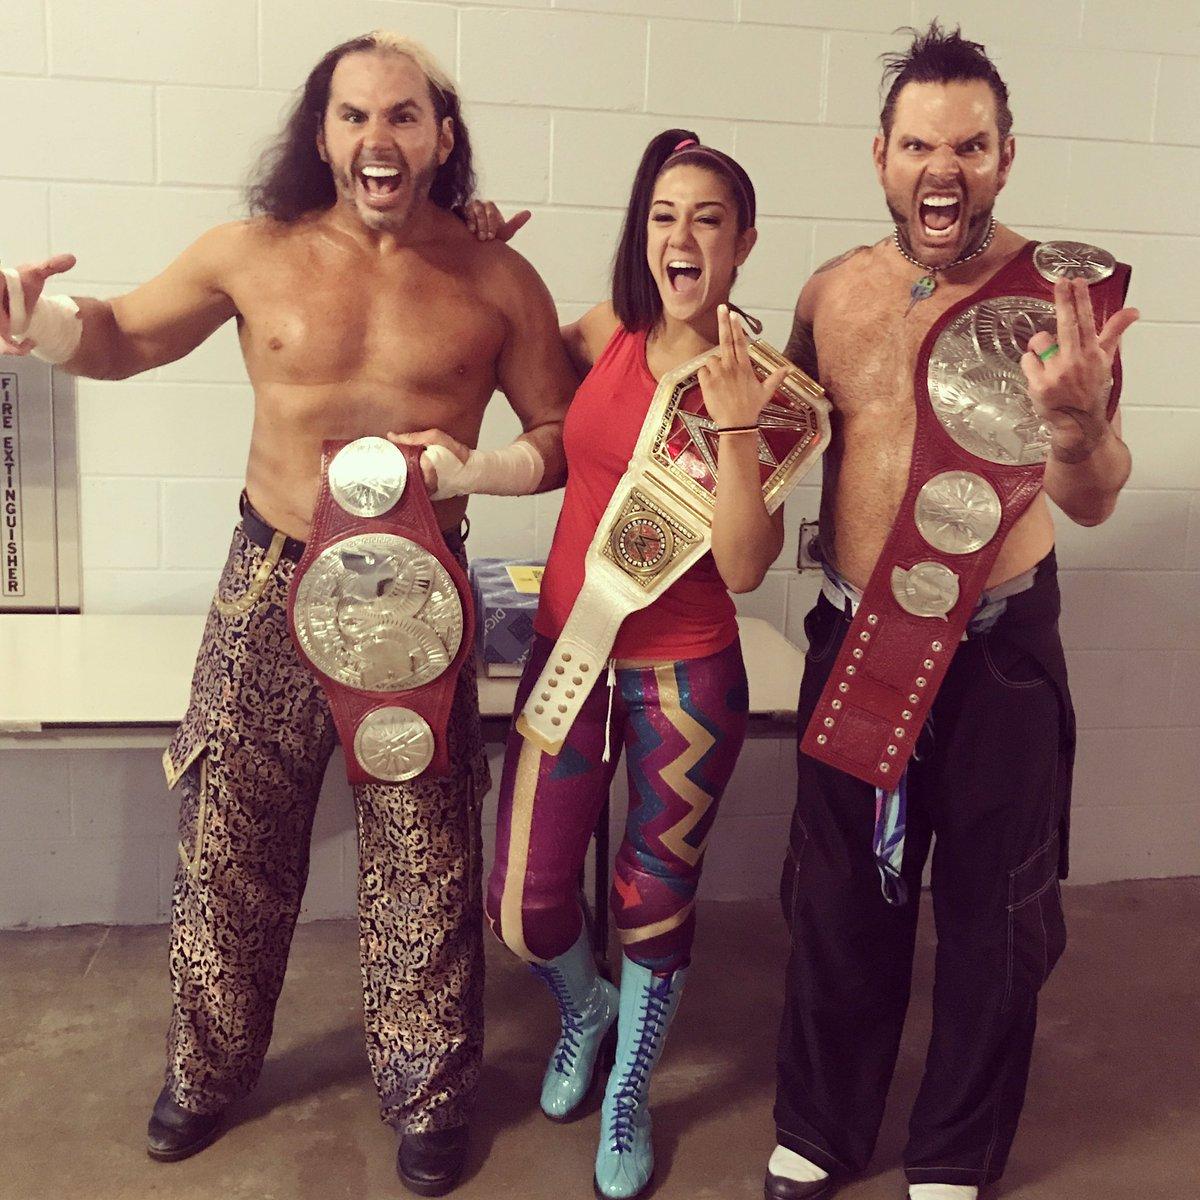 Instagram Bayley WWE nude photos 2019